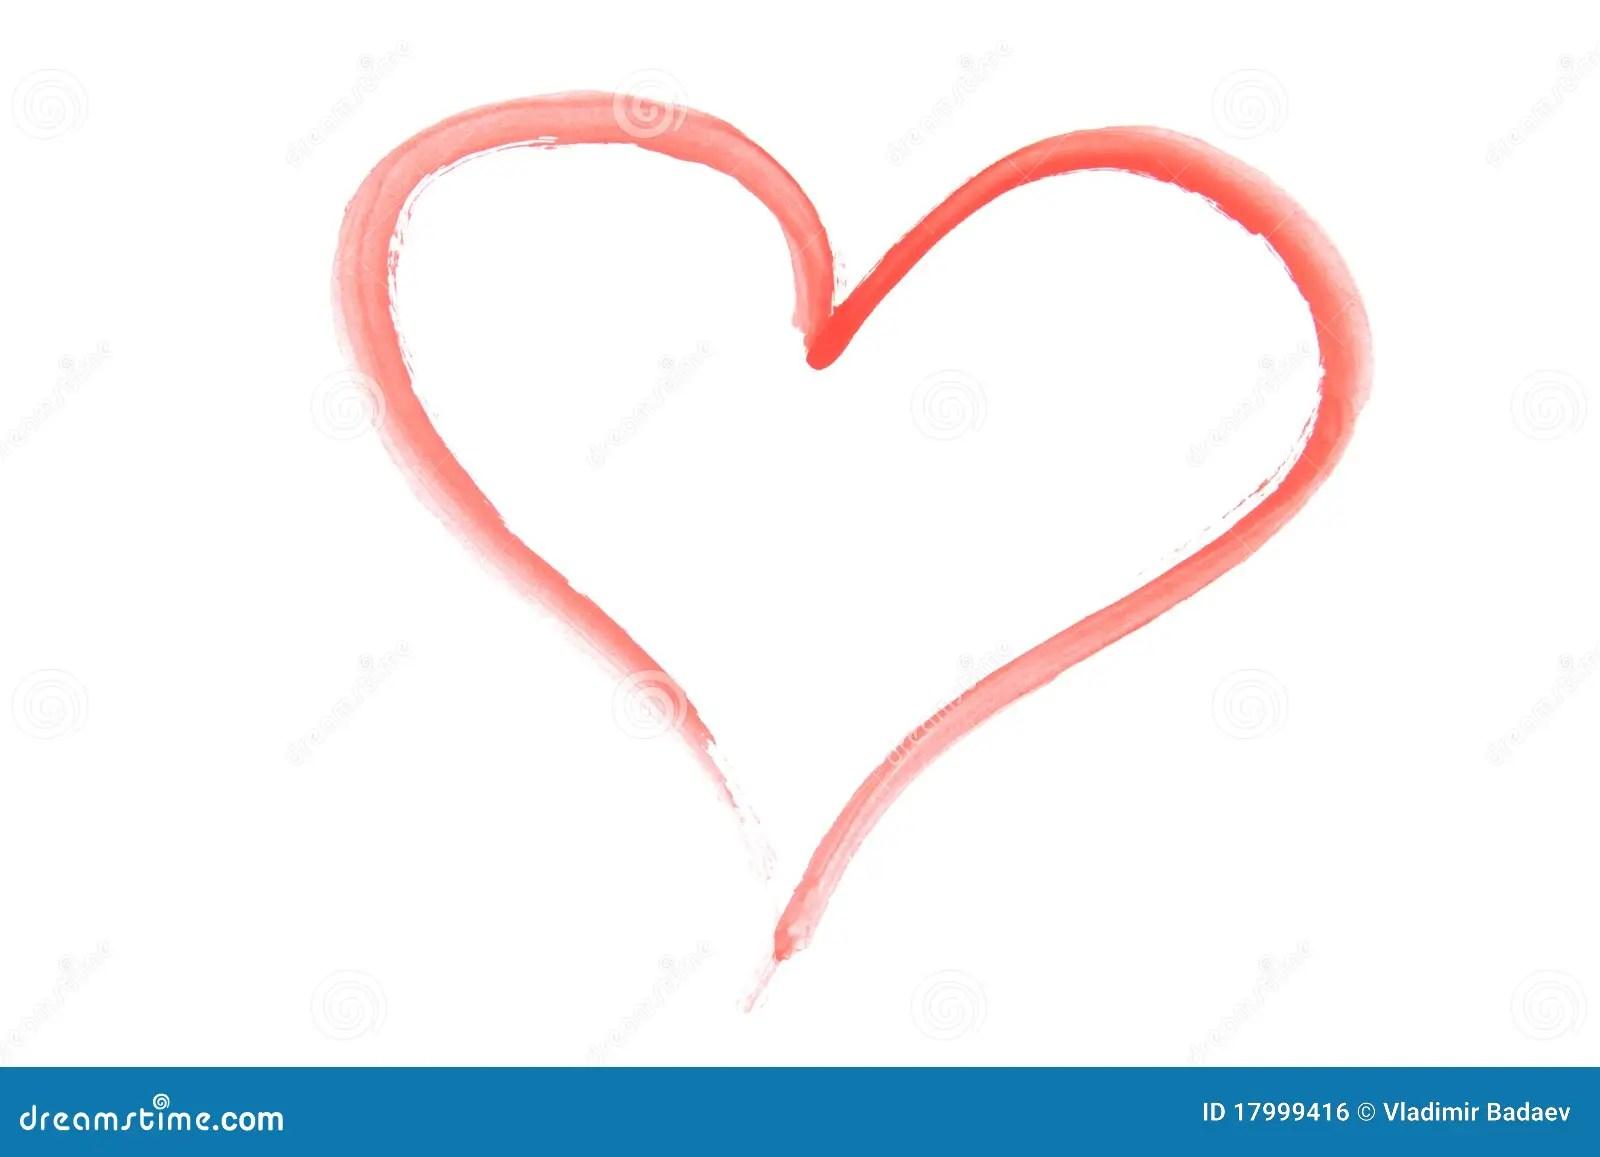 Drawn Happy Valentines Heart Royalty Free Stock Image